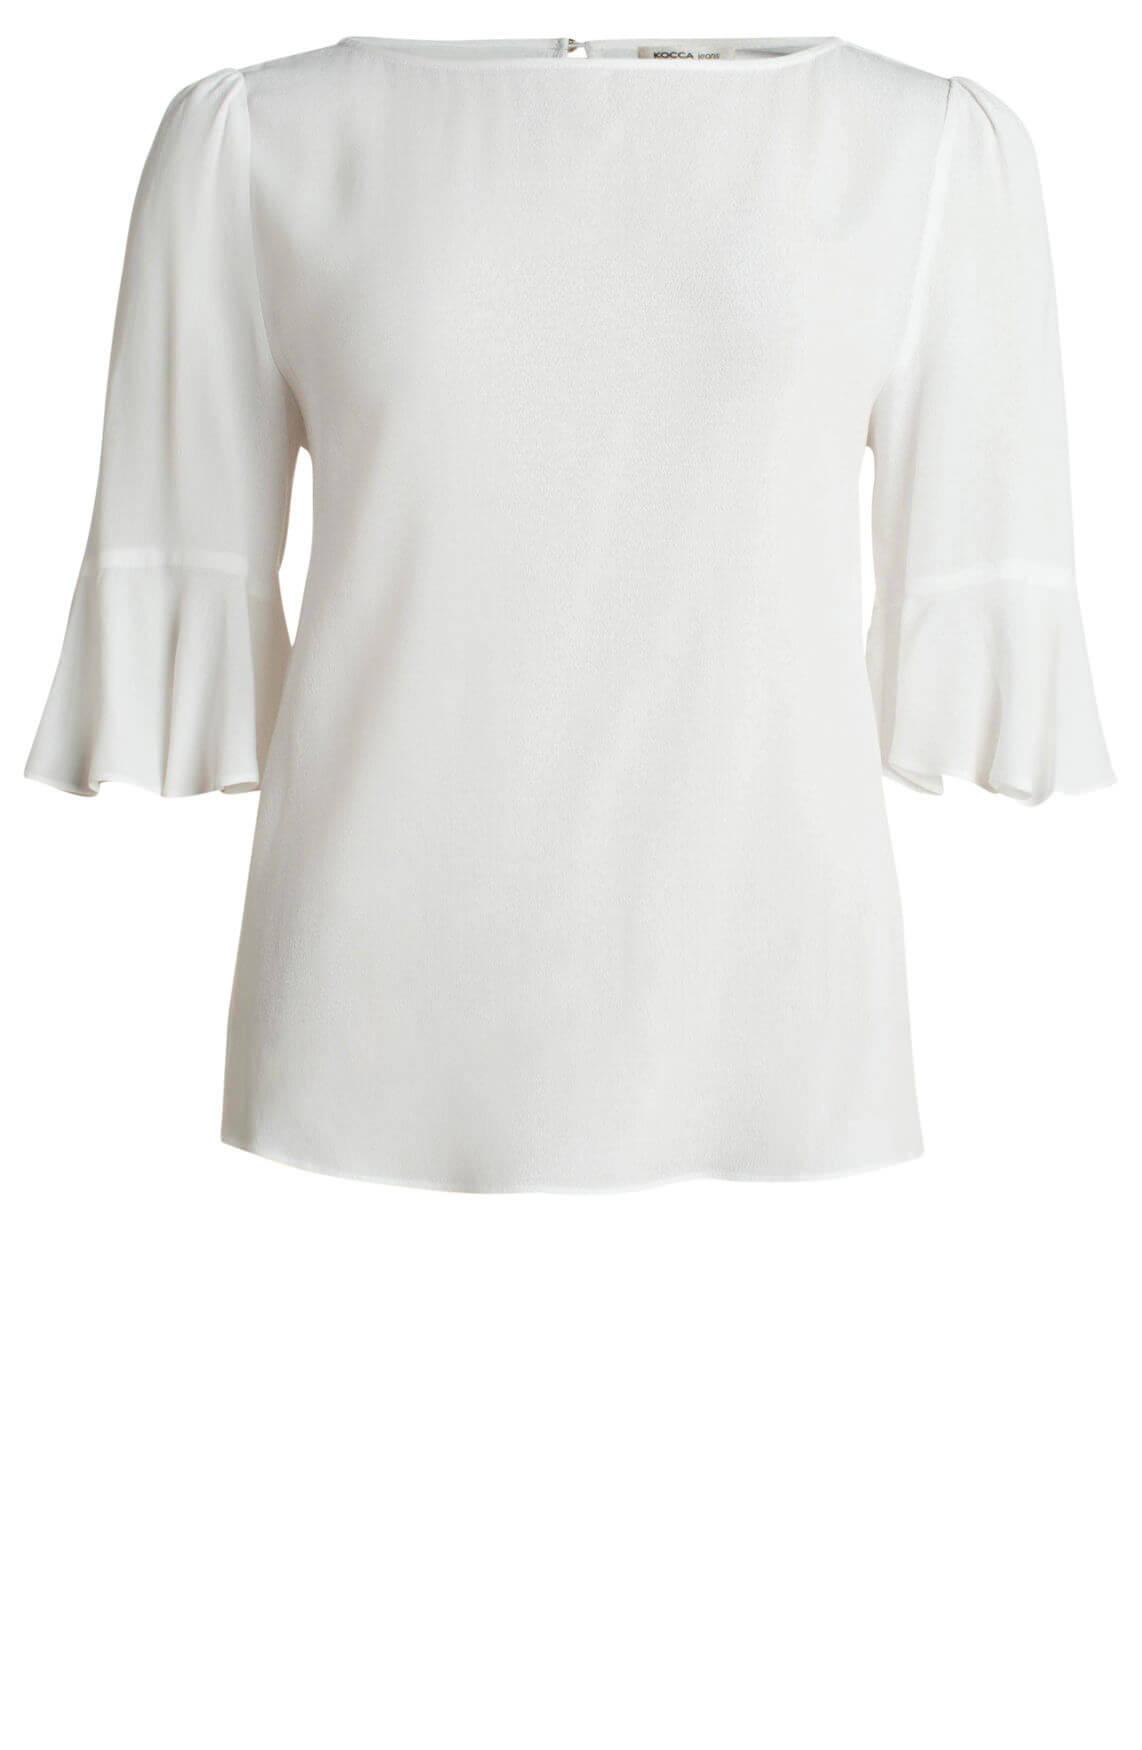 Kocca Dames Orange blouse wit